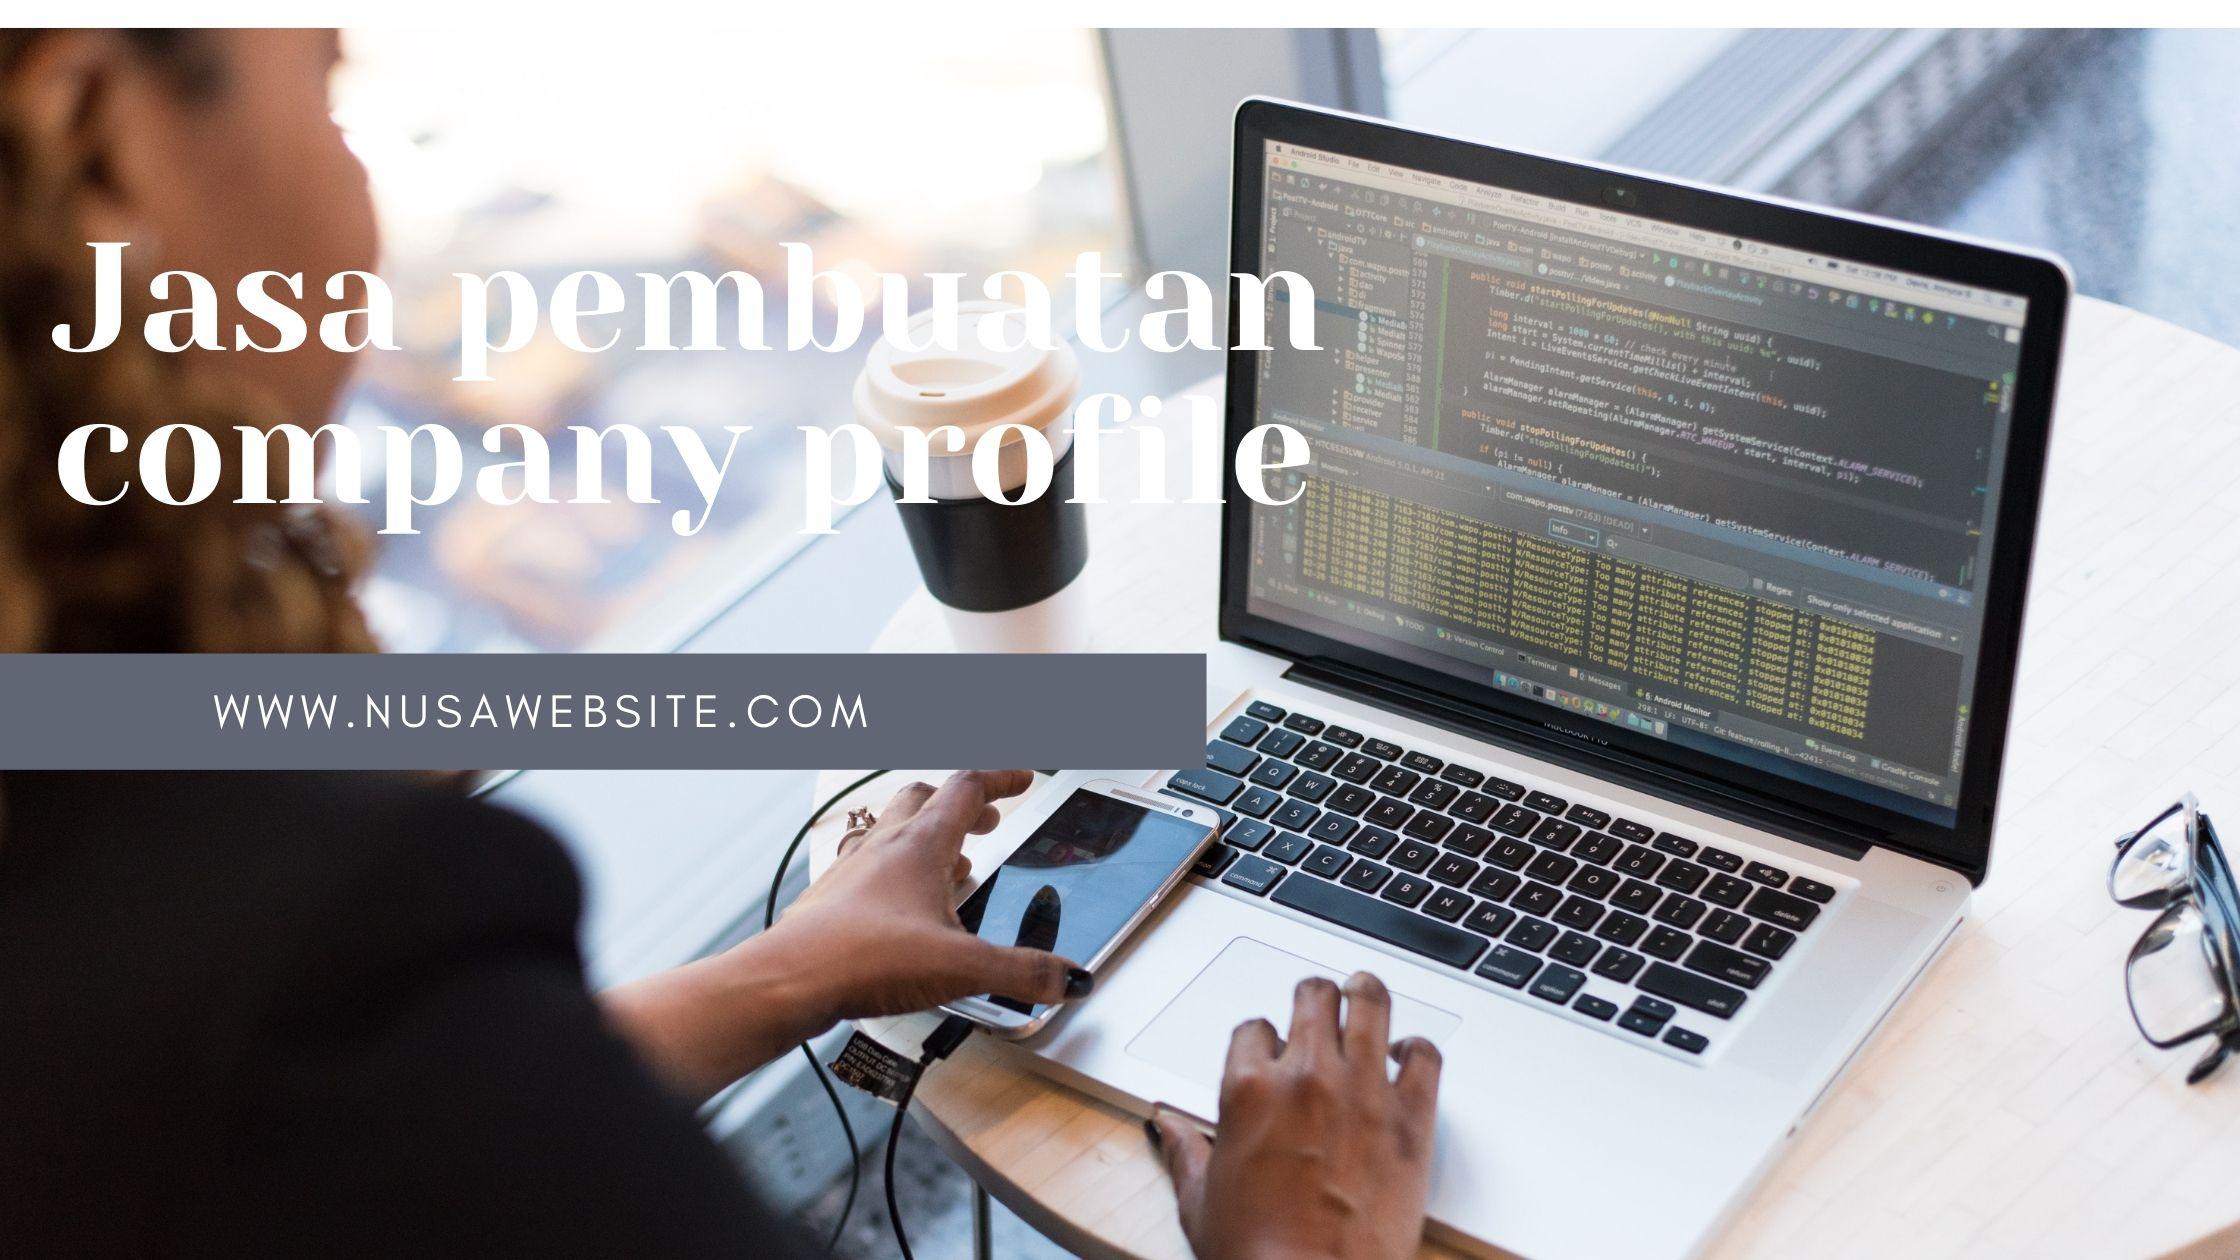 company profile freepik